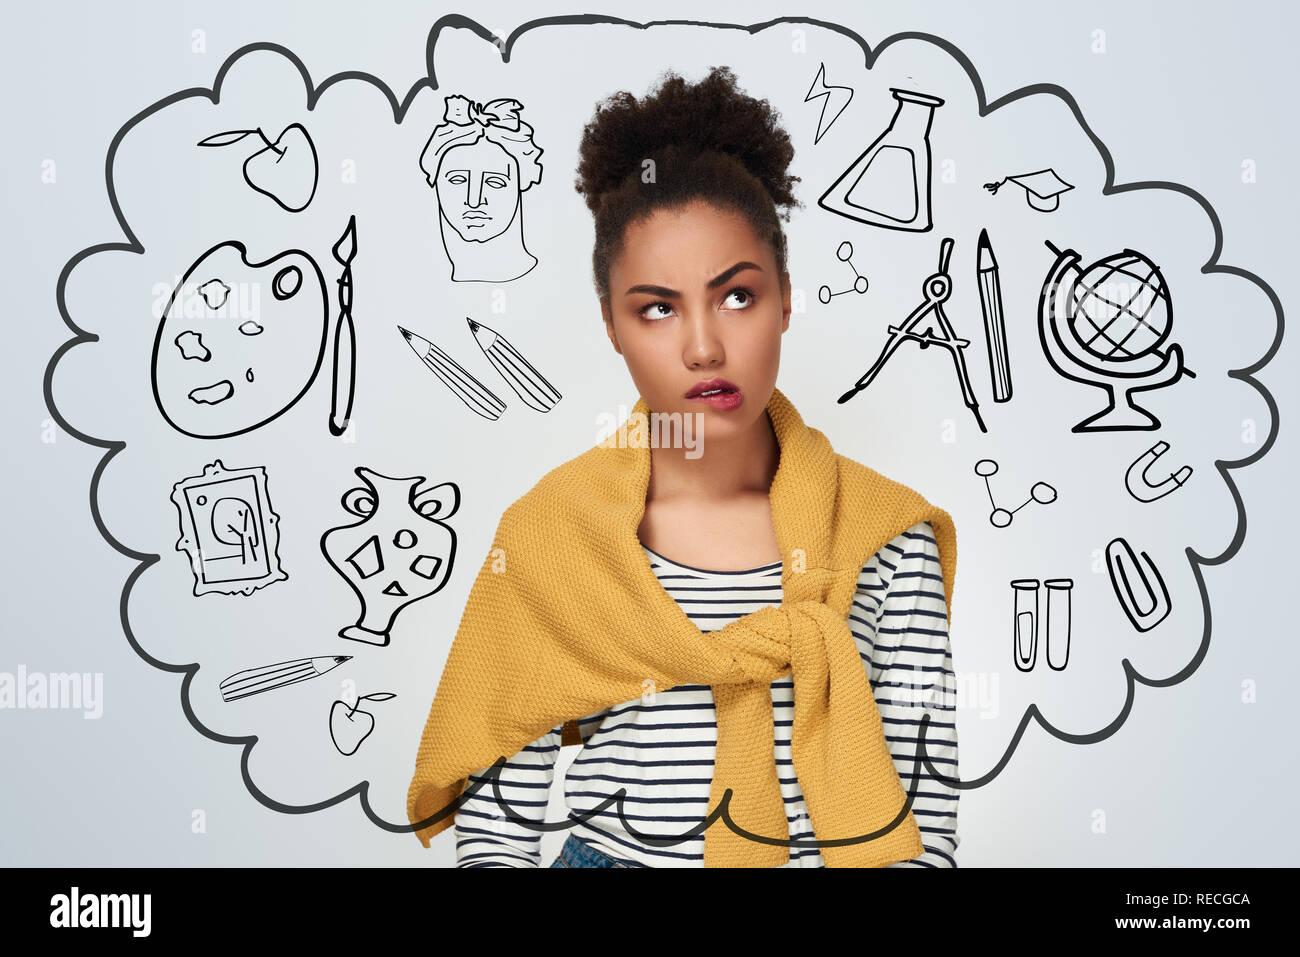 671f9e23e Mujer joven studio se encuentran aisladas en pared blanca morder labio  mirando preocupado Imagen De Stock